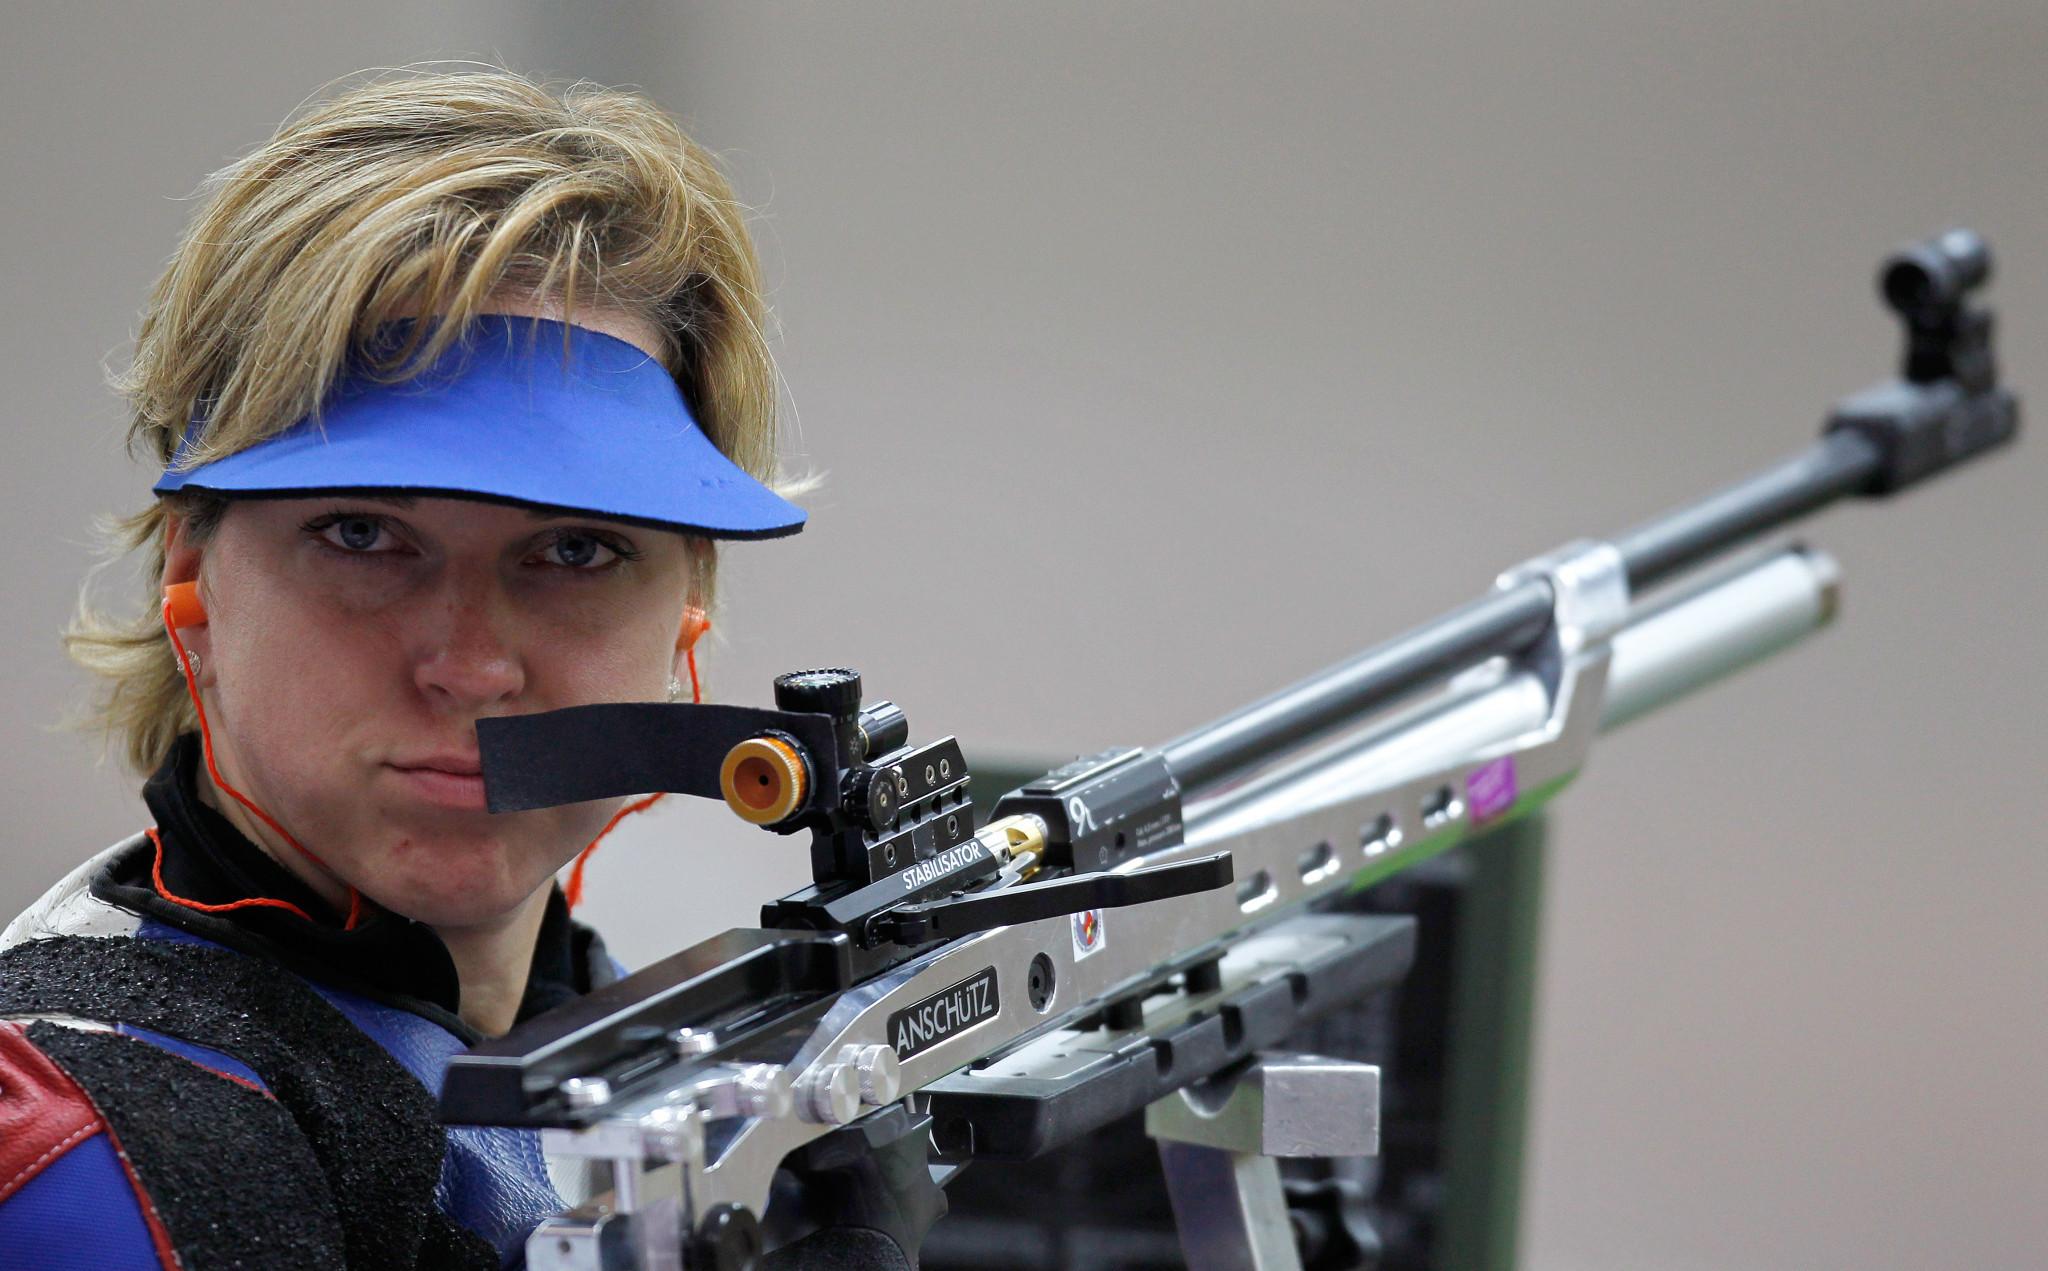 Vadovičová looking to return to gold standard at World Shooting Para Sport Championships